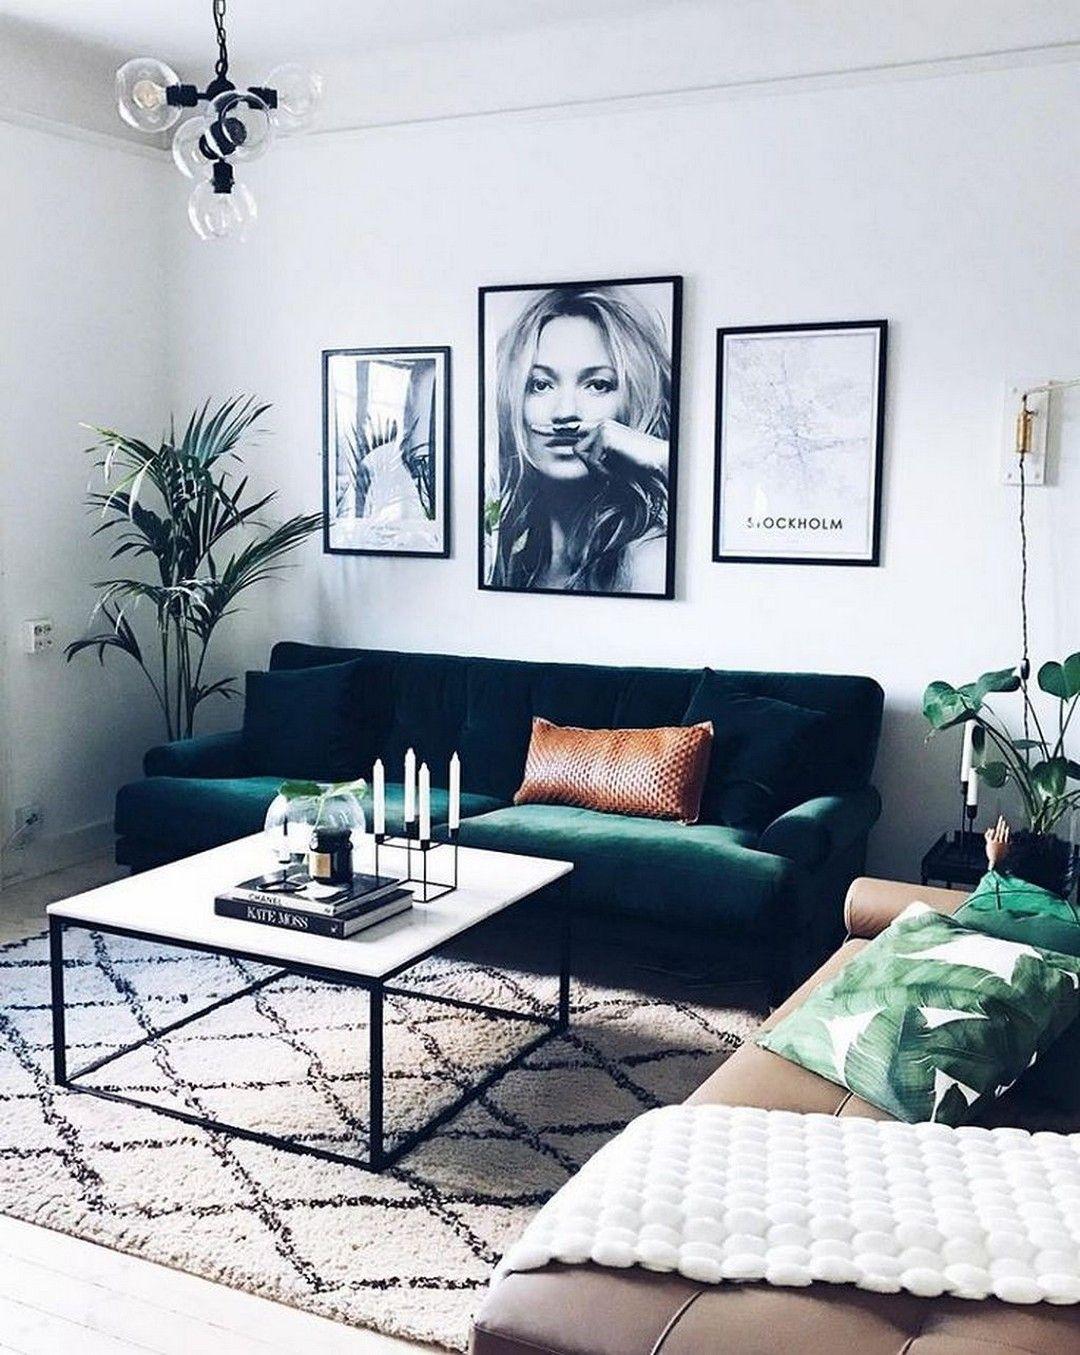 Phenomenal 15 Cozy First Apartment Decorating Ideas On A Budget Beutiful Home Inspiration Xortanetmahrainfo